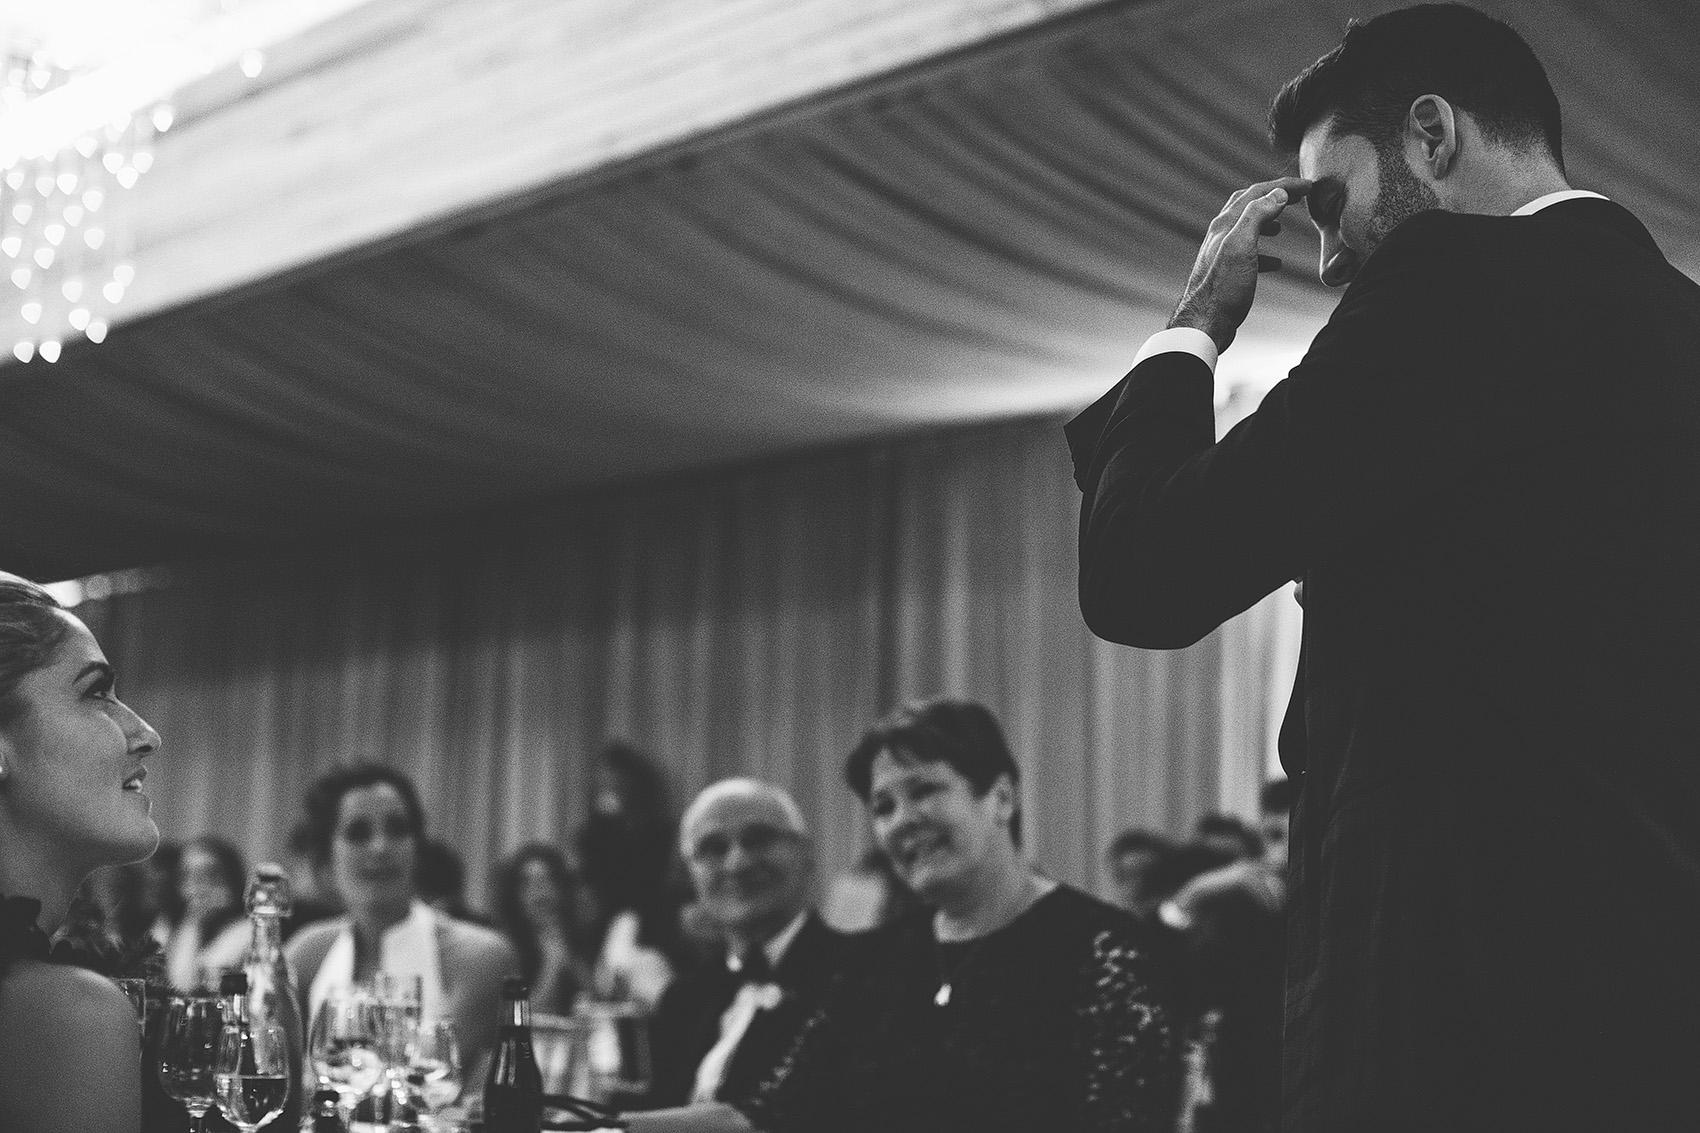 elmore-court-wedding-photography-69.jpg